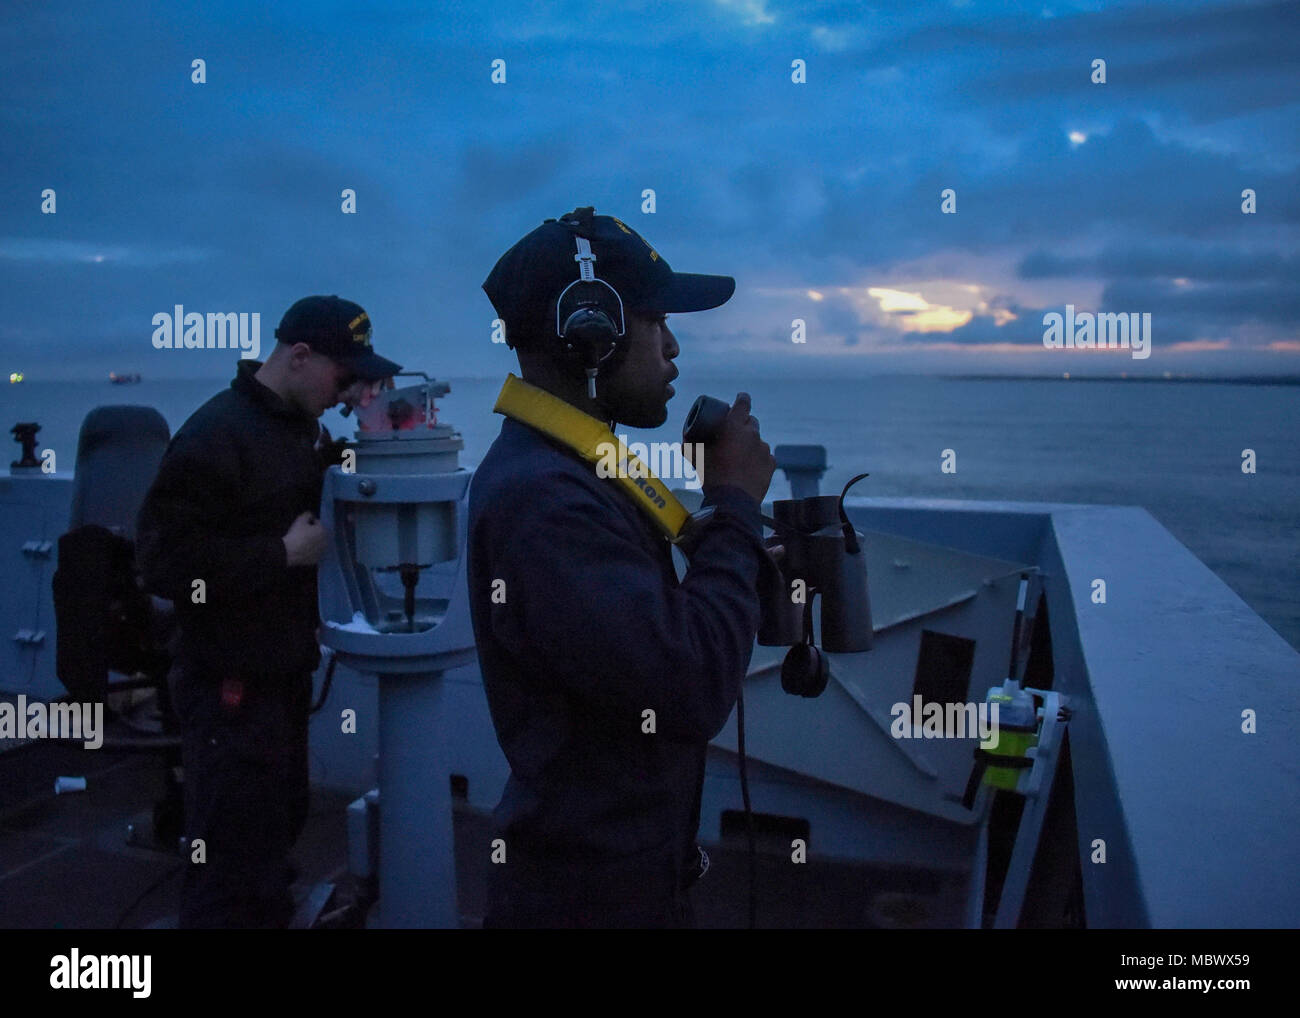 Dillion Stockfotos & Dillion Bilder - Alamy